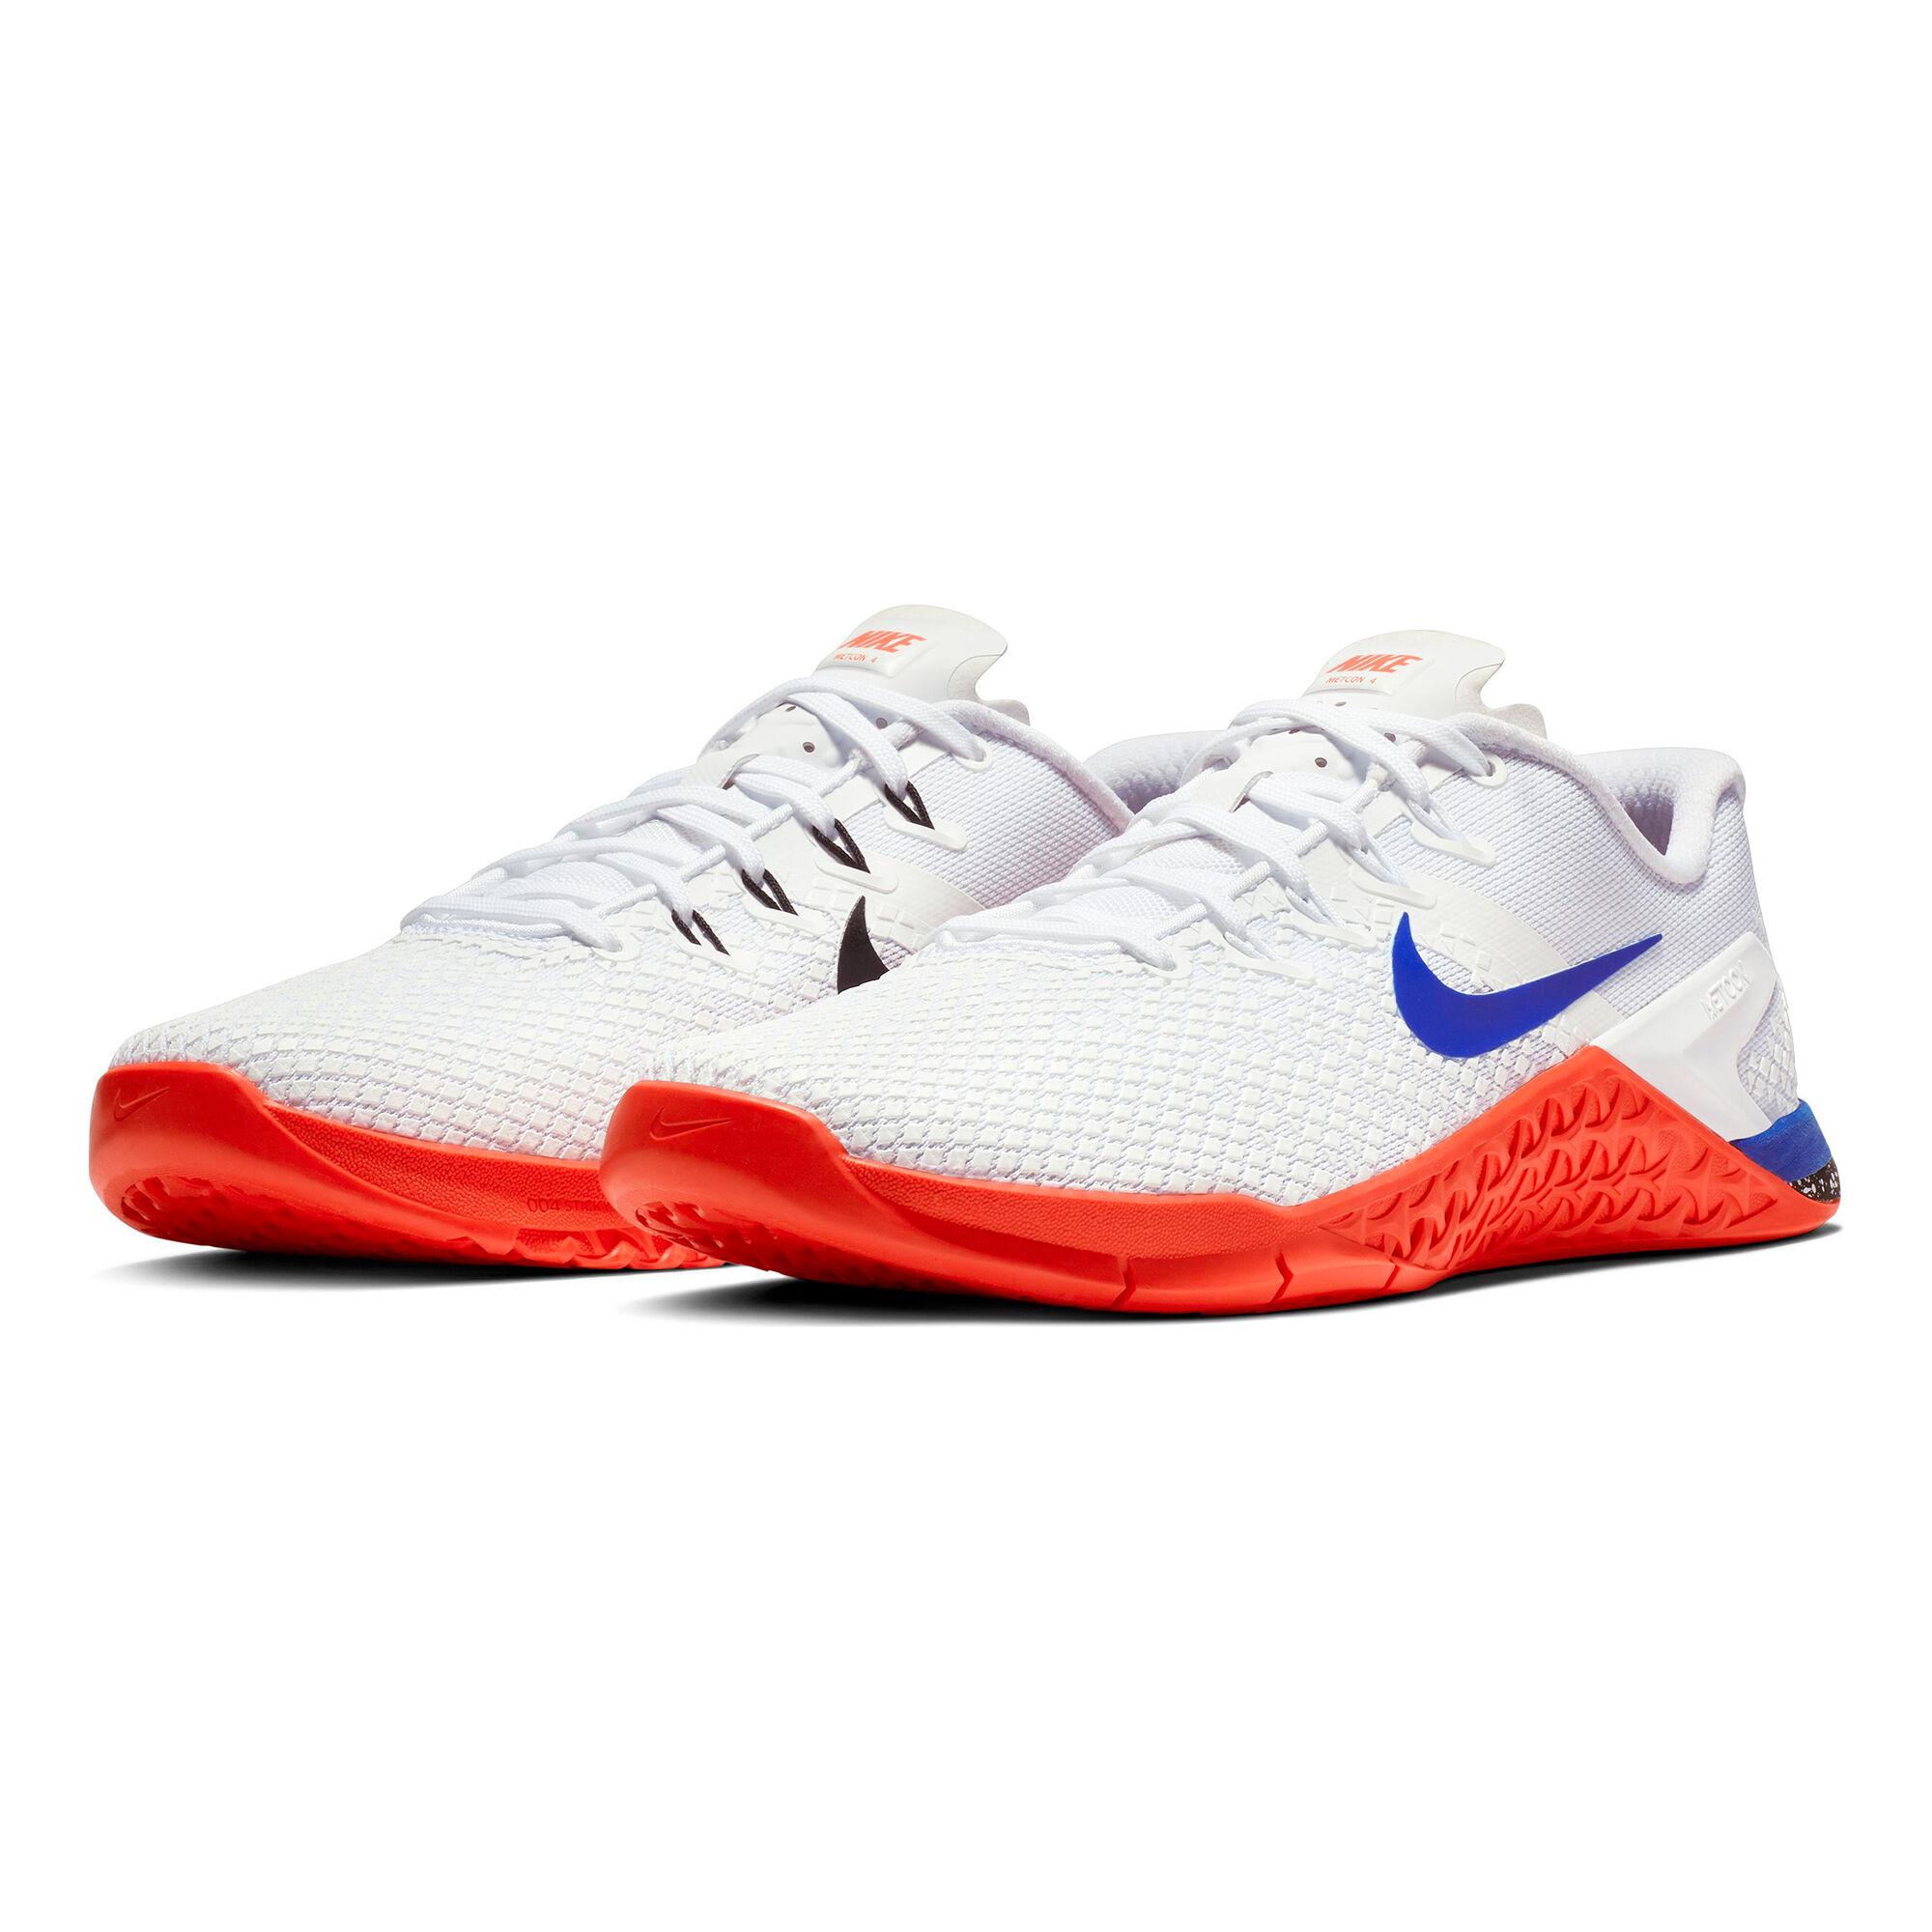 buy online 37394 927d8 Nike Metcon 4 XD Träningssko, Fitness Damer - Vit, Blå köp o